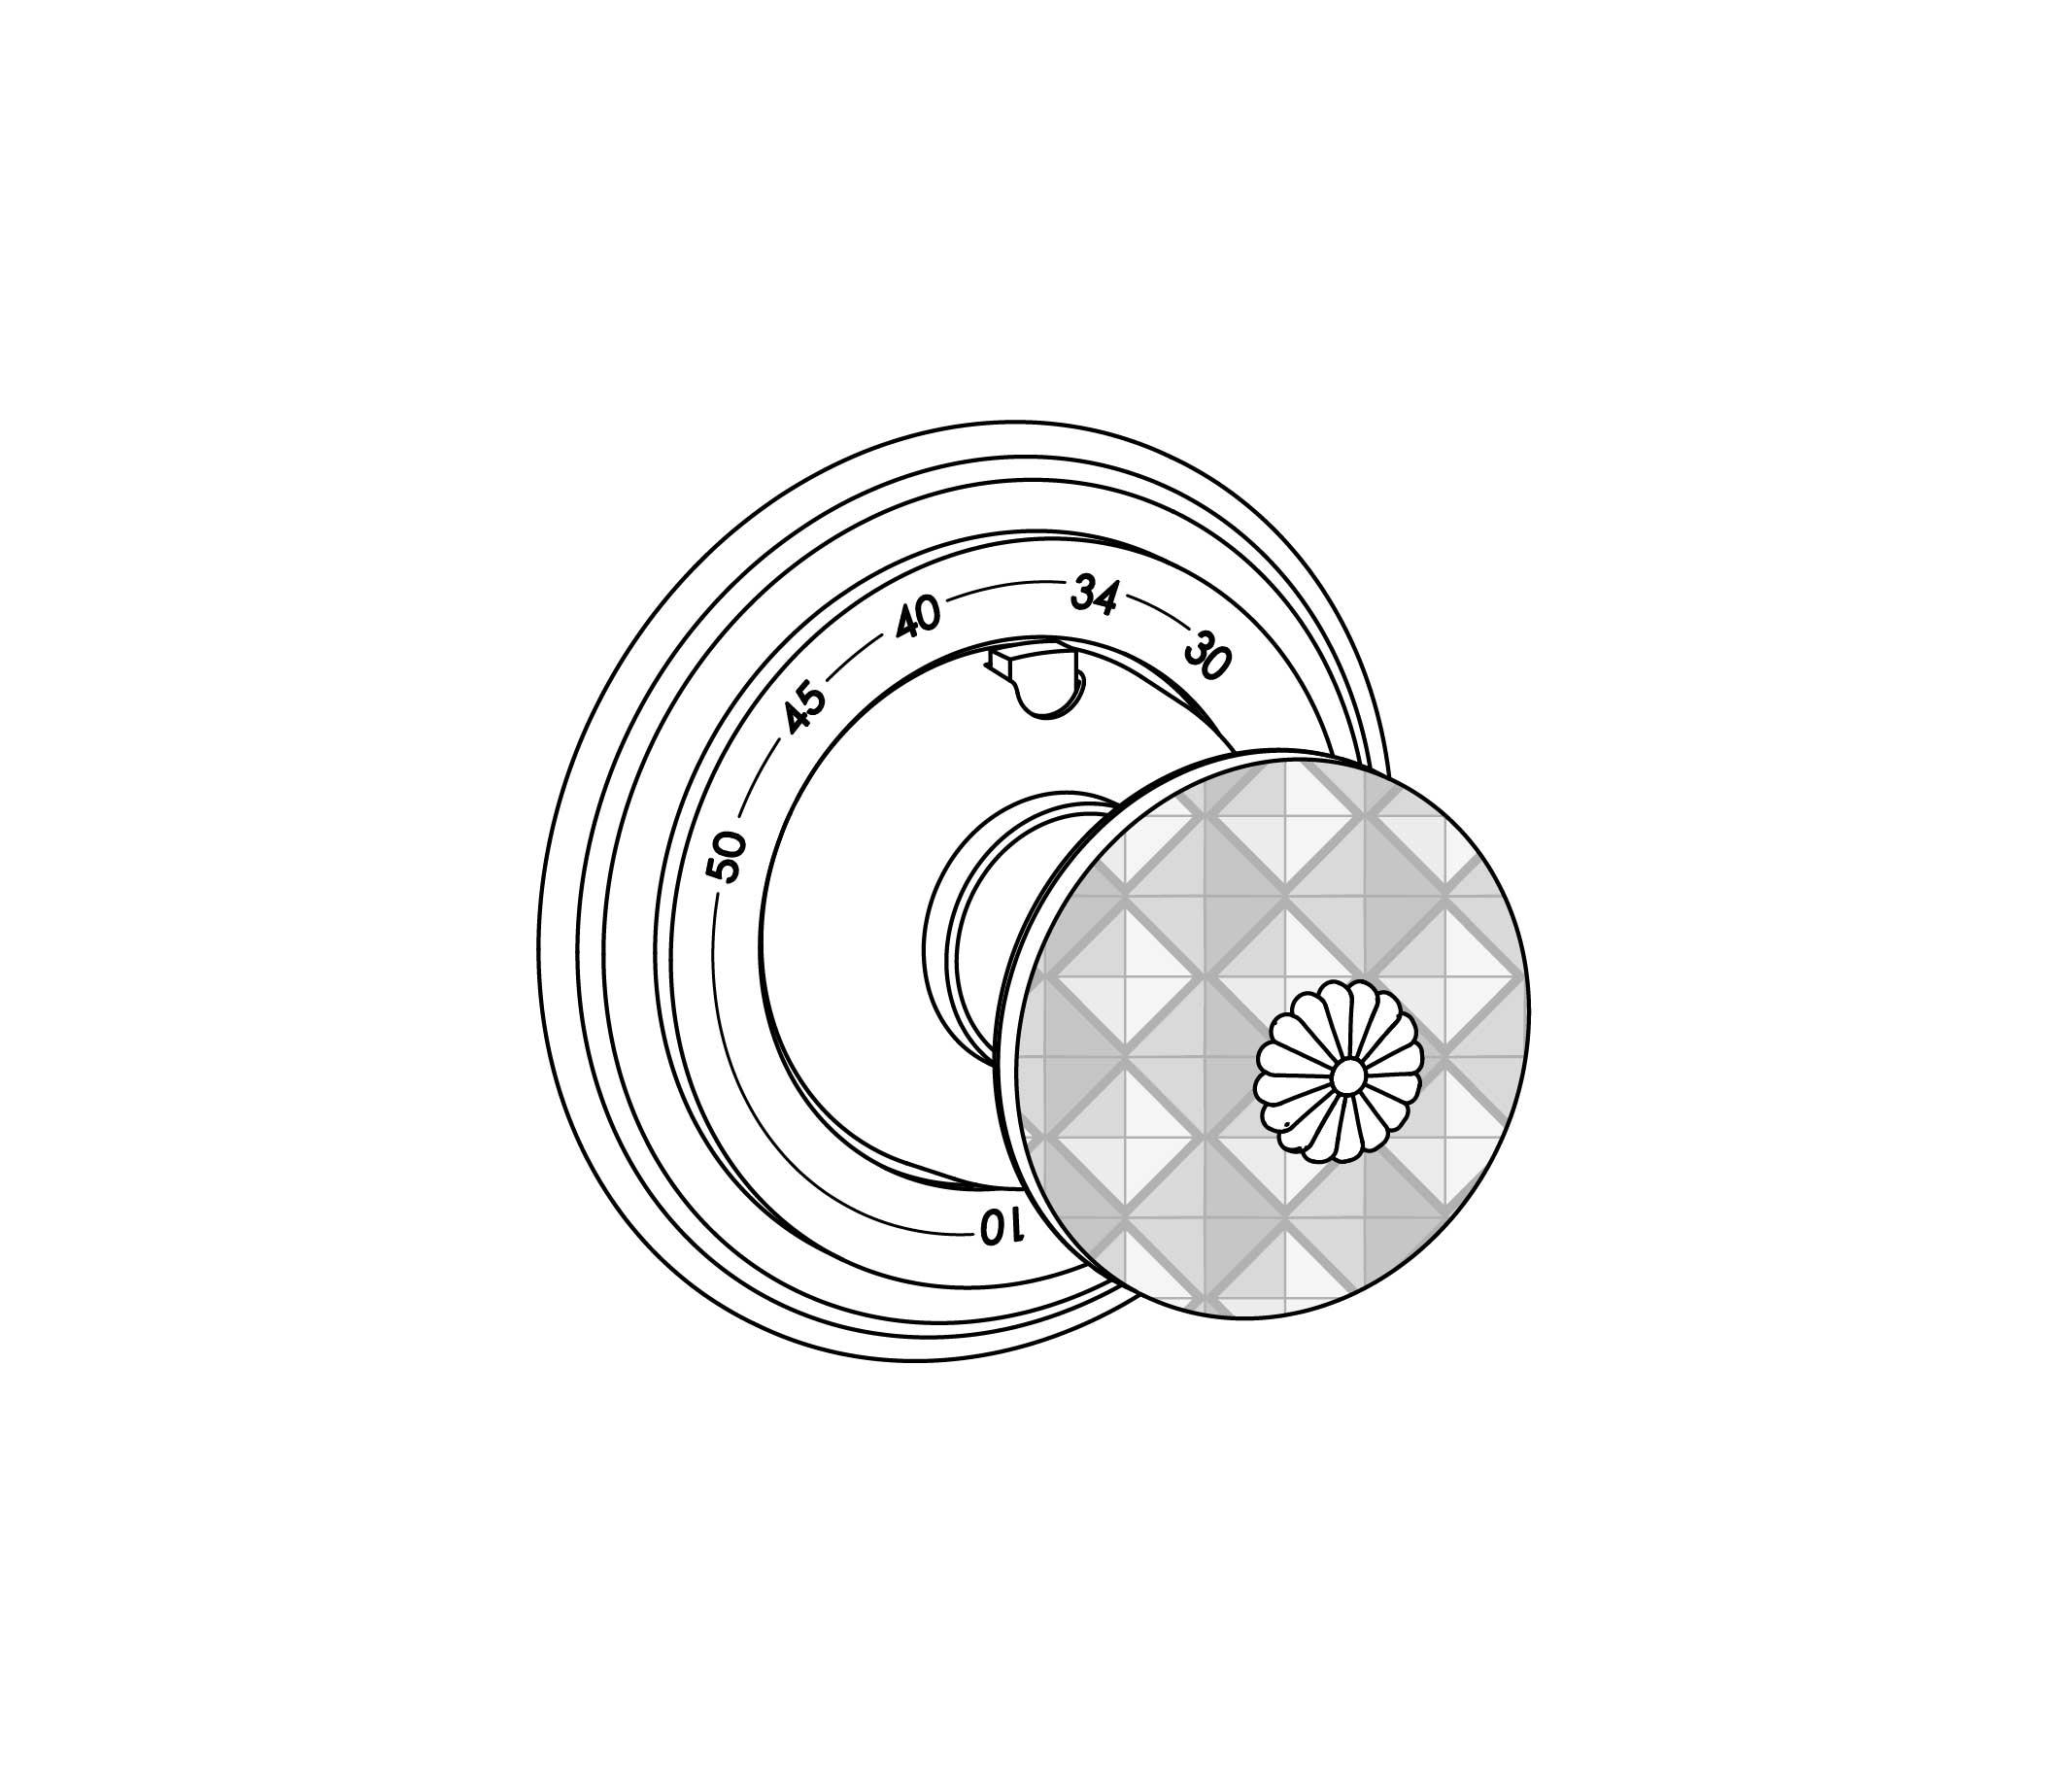 C45-4R0 Plaque ronde Ø80mm